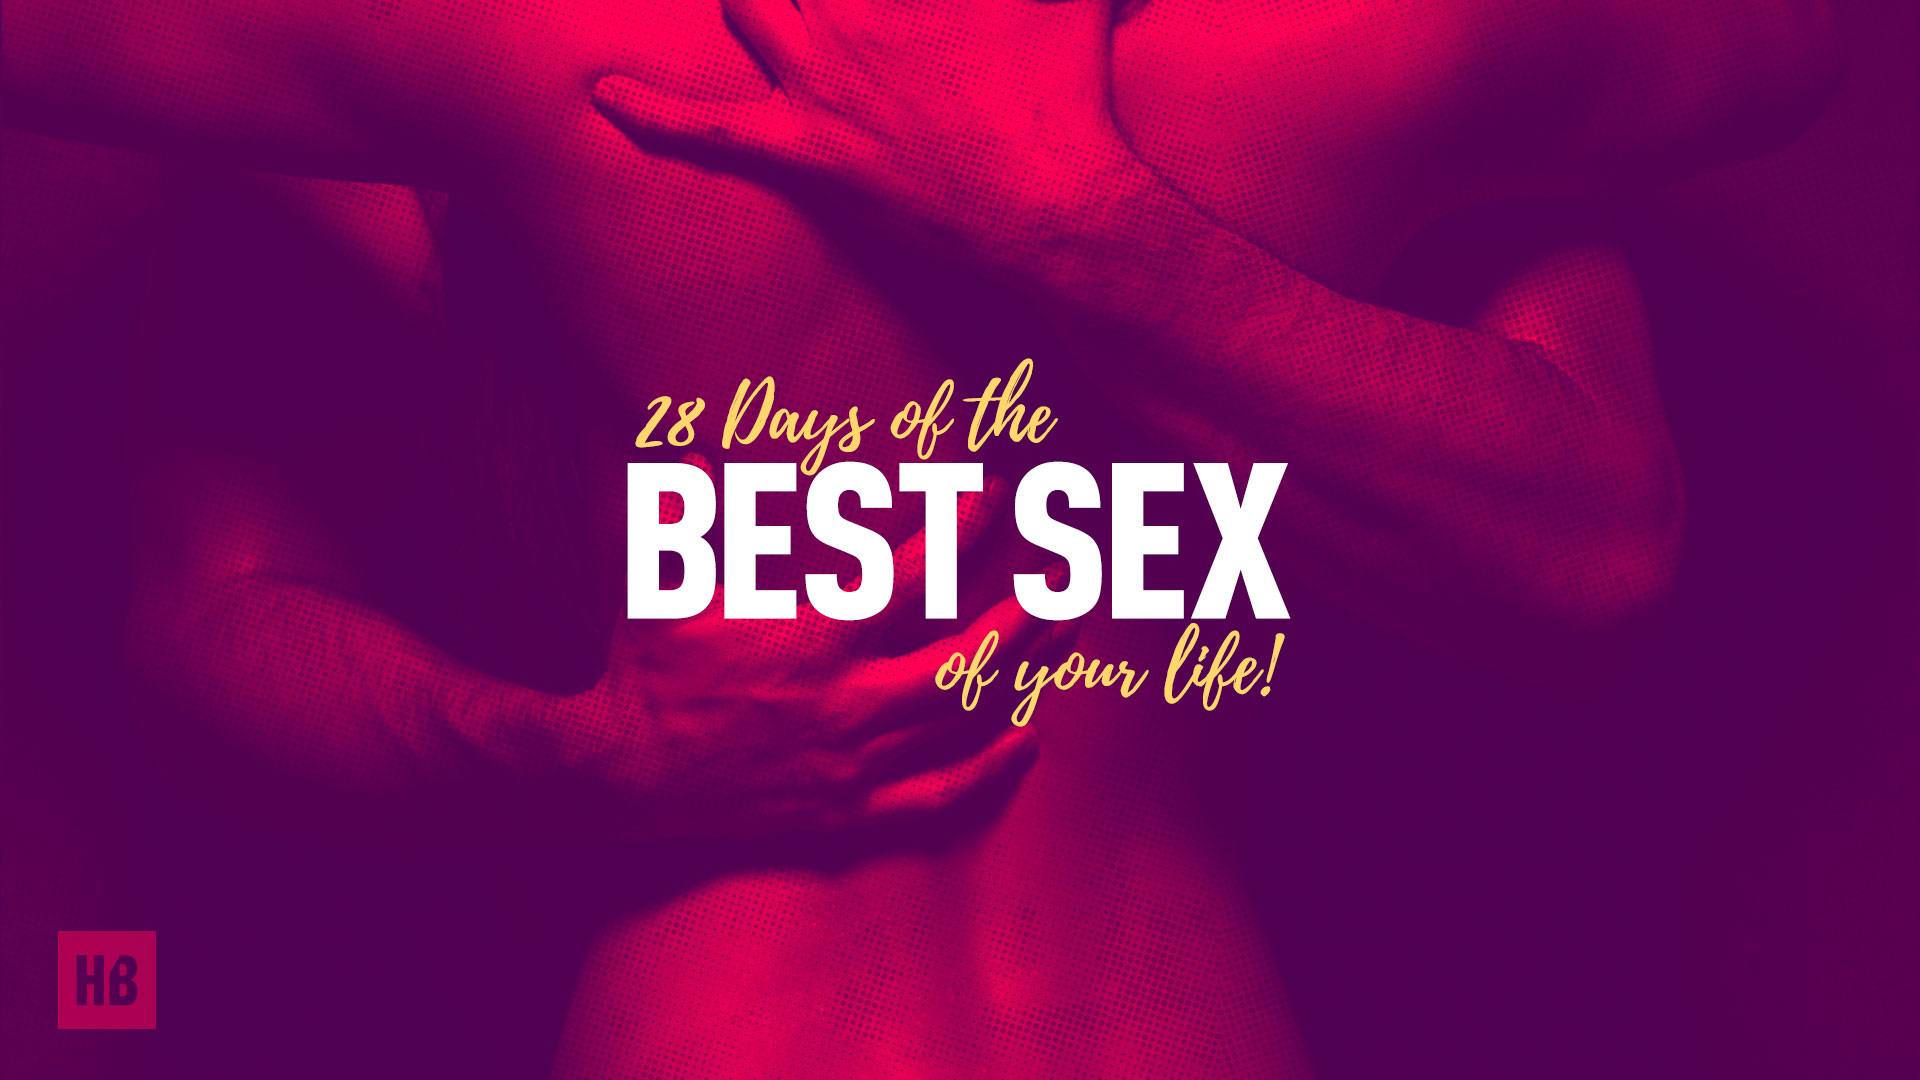 28 days of sex